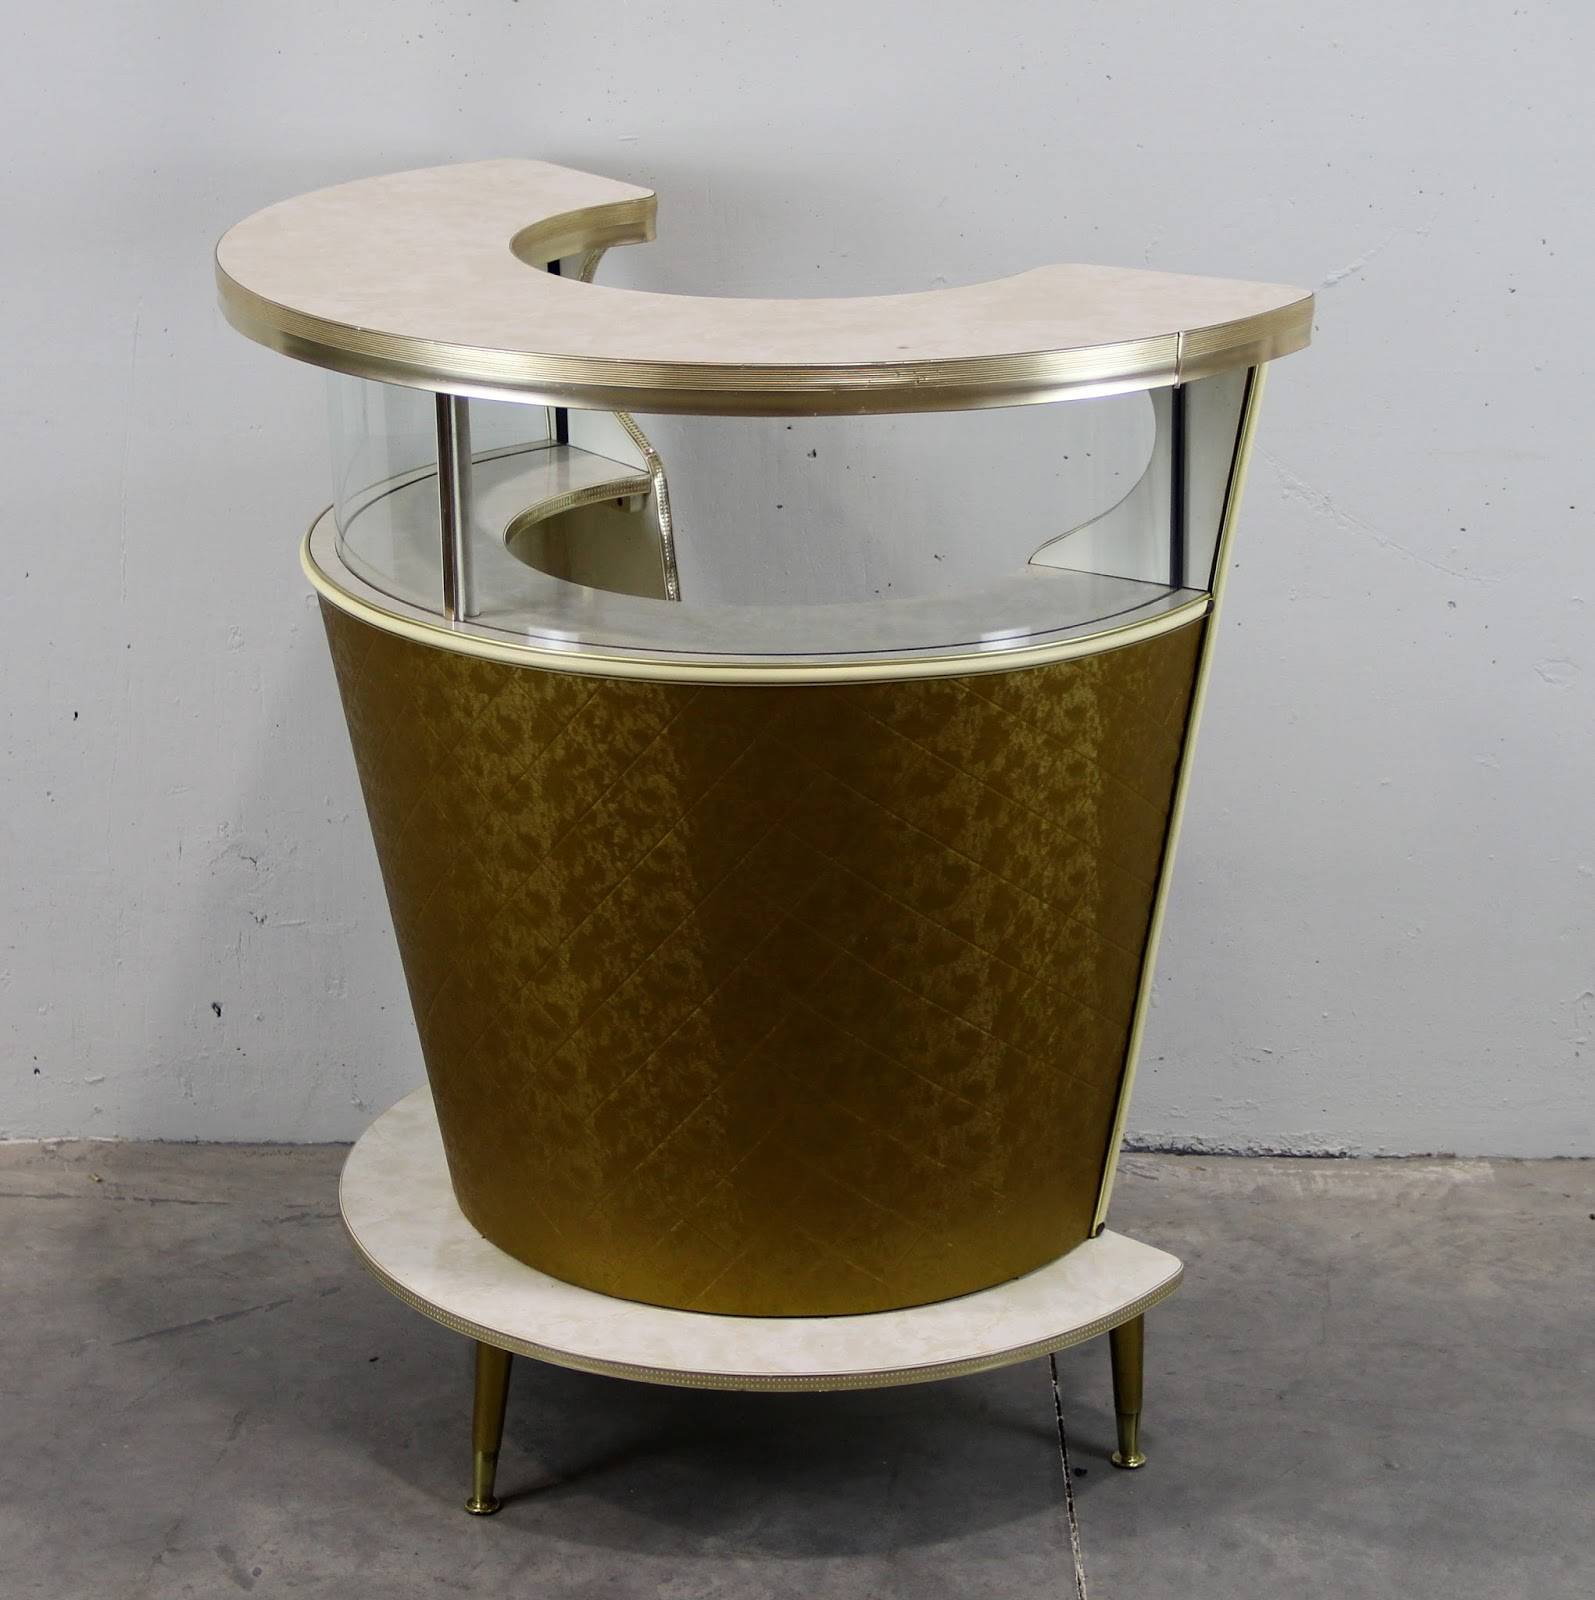 Barra de mosca compac dorada vintage